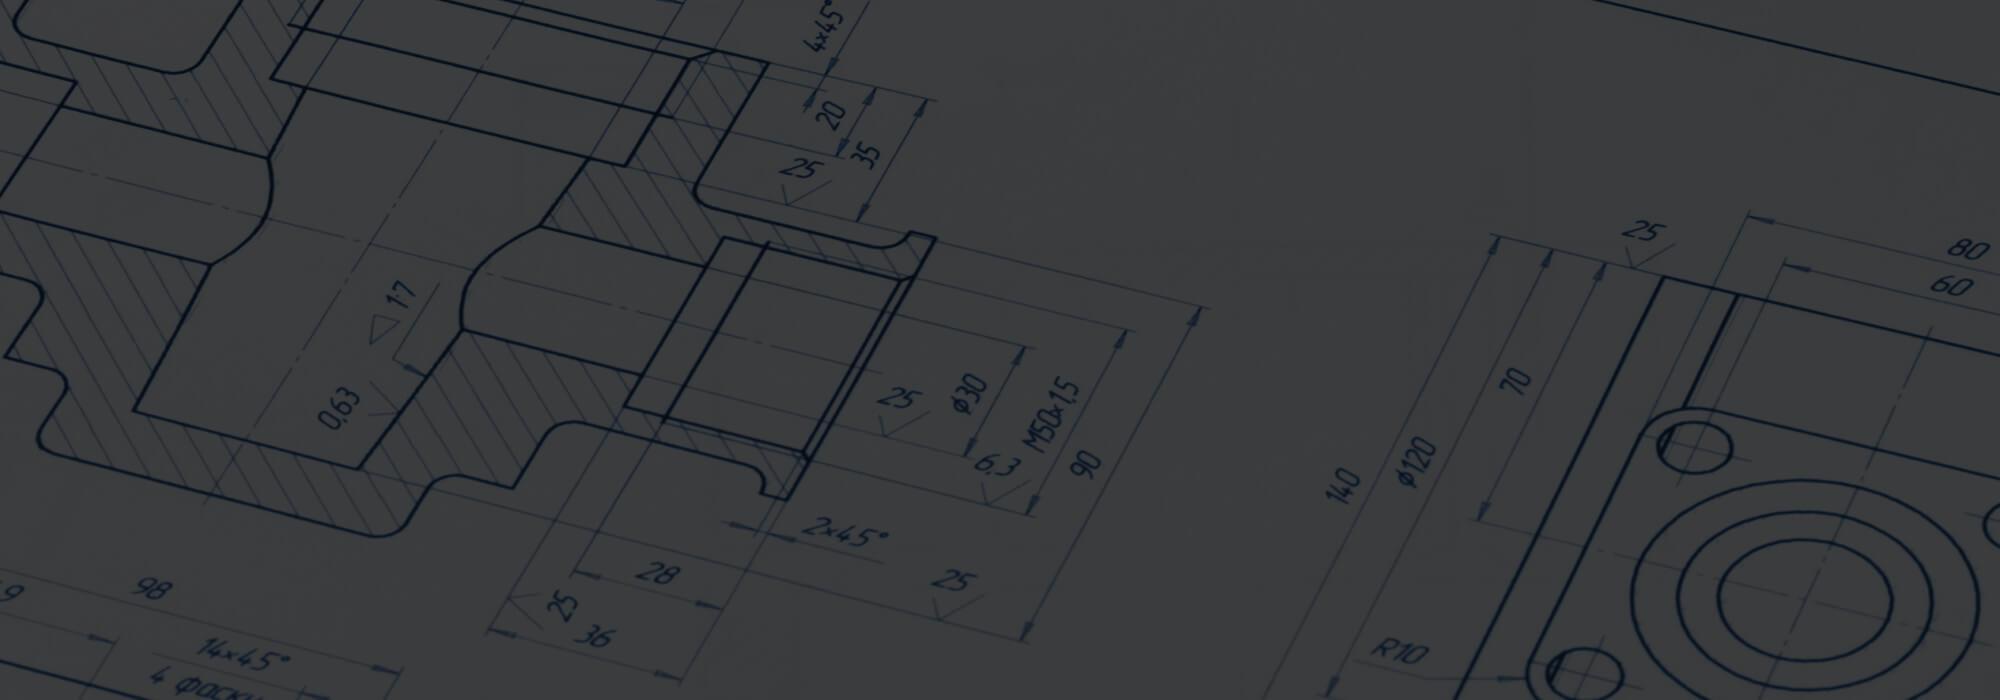 hight resolution of rv wiring diagram u0026 rv plumbing diagram u2013 request technical assistancerequest rv diagrams or